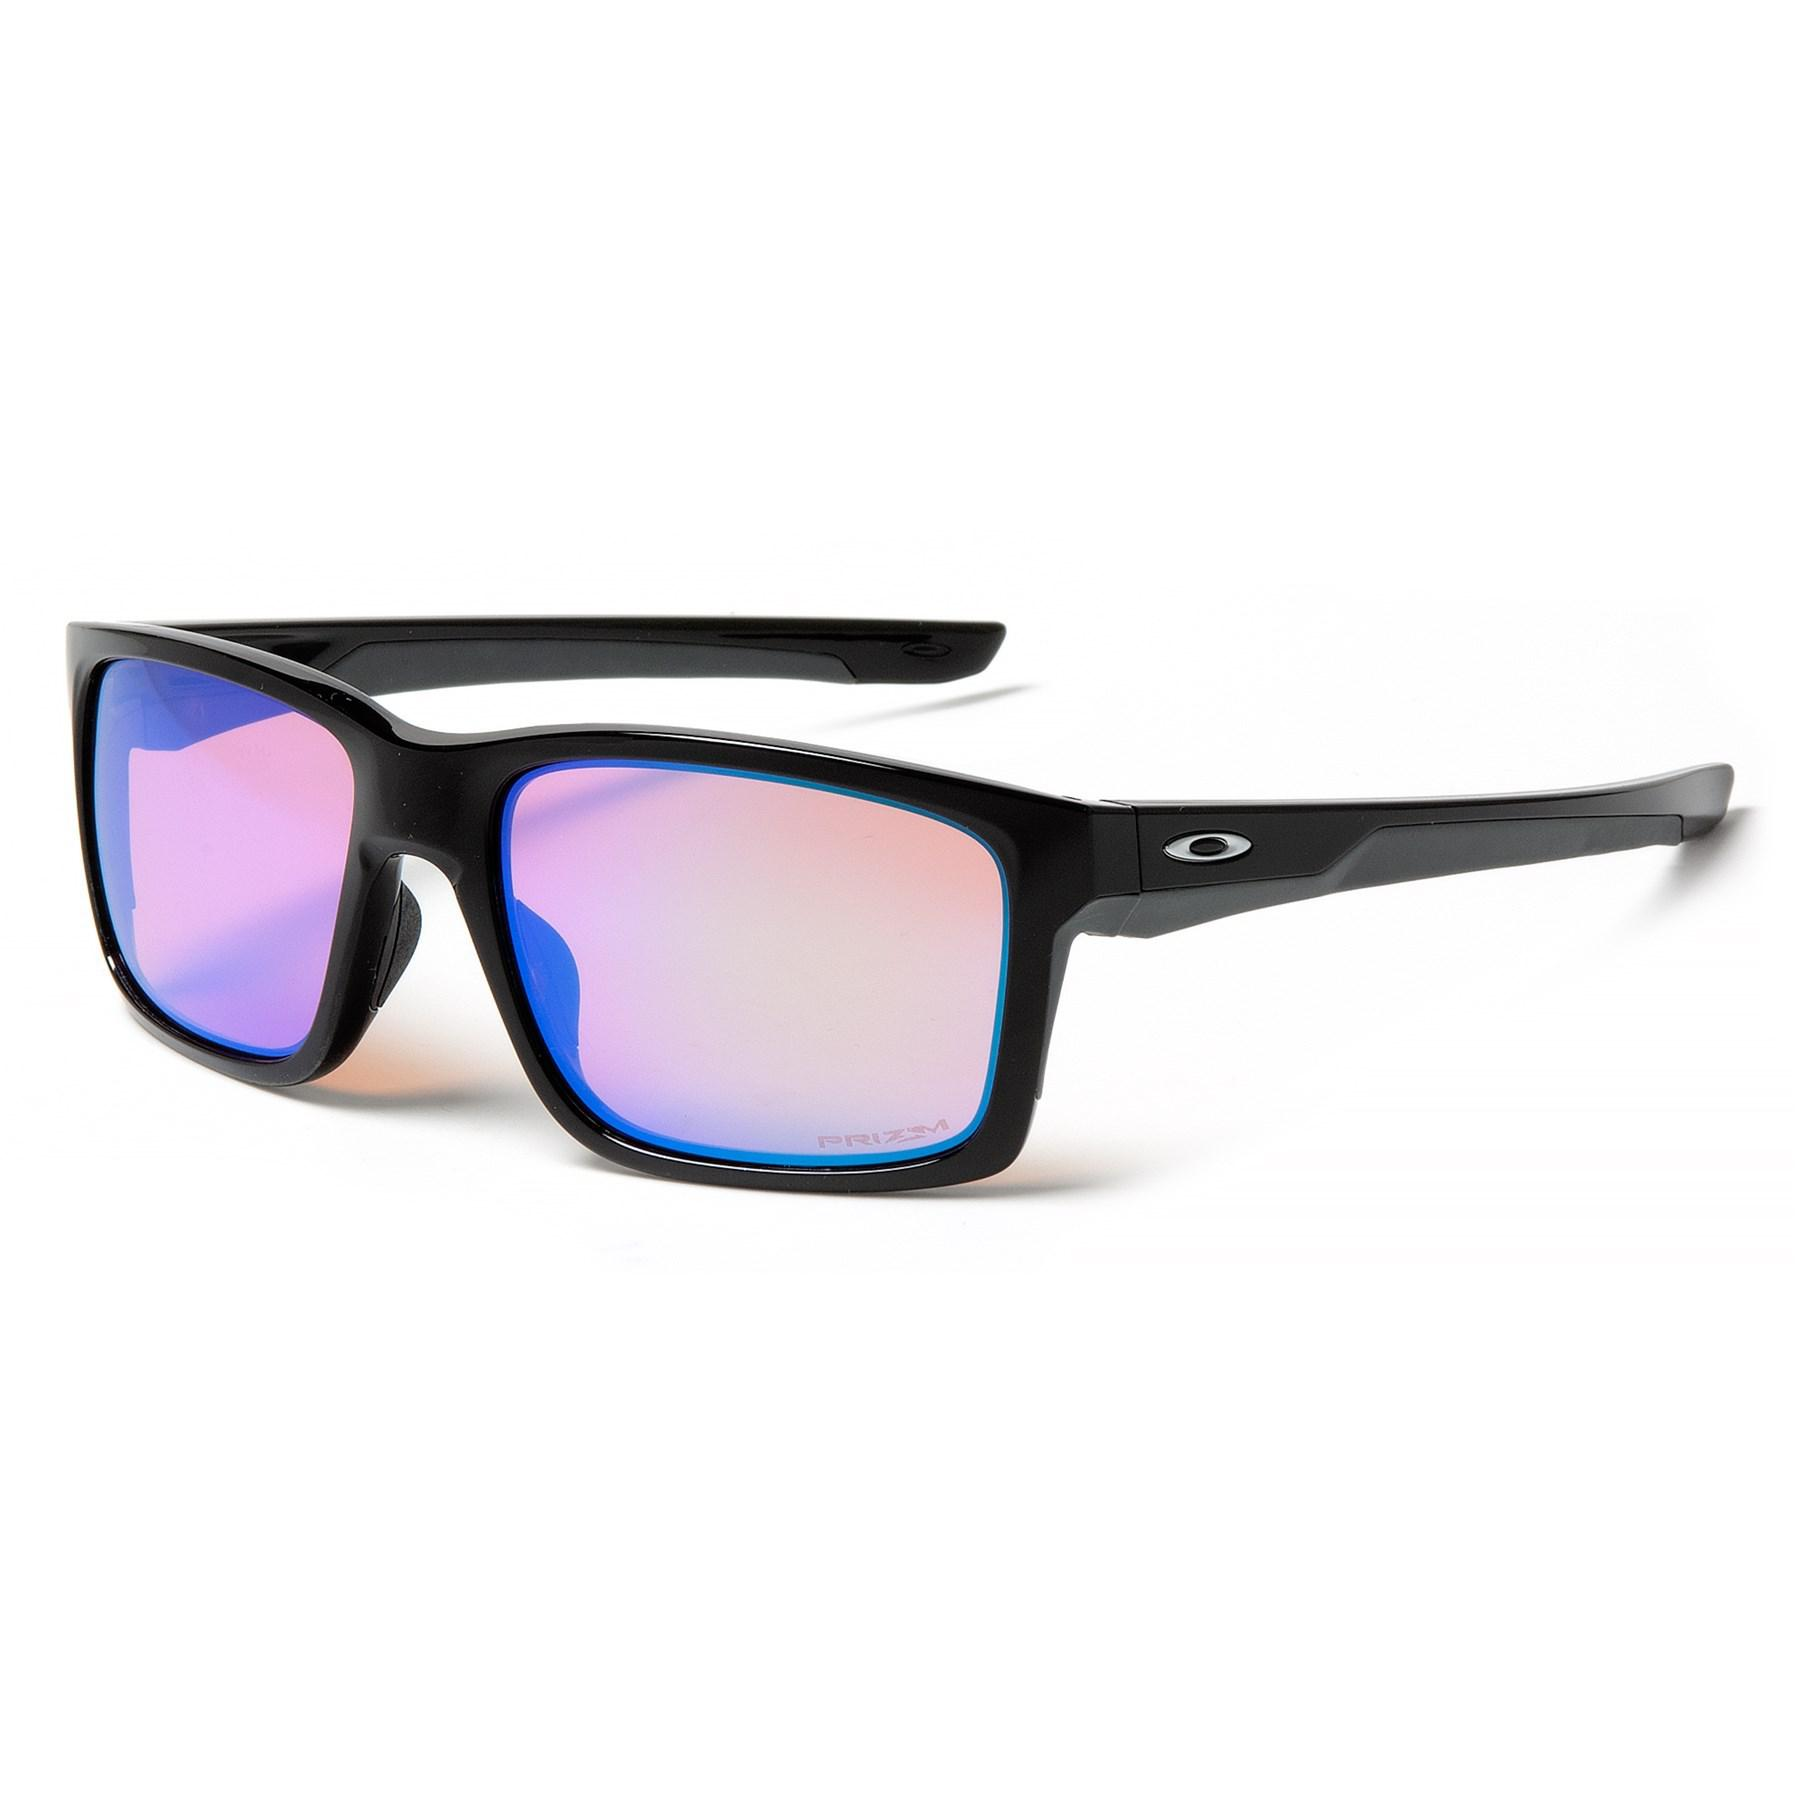 8efb25be1ac Lyst - Oakley Mainlink Prizm® Sunglasses (for Men) in Black for Men